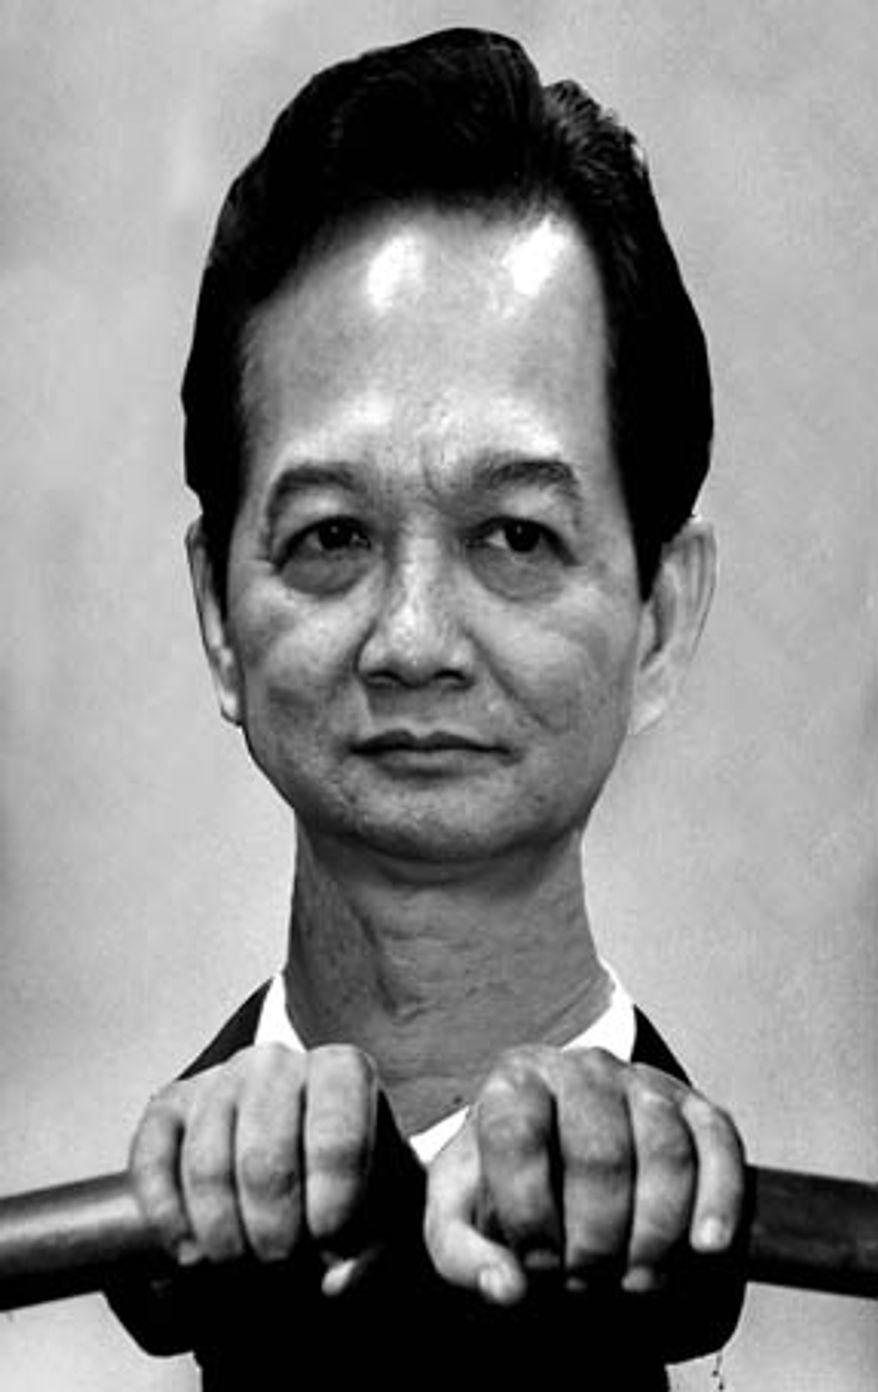 Illustration: Nguyen Tan Dung